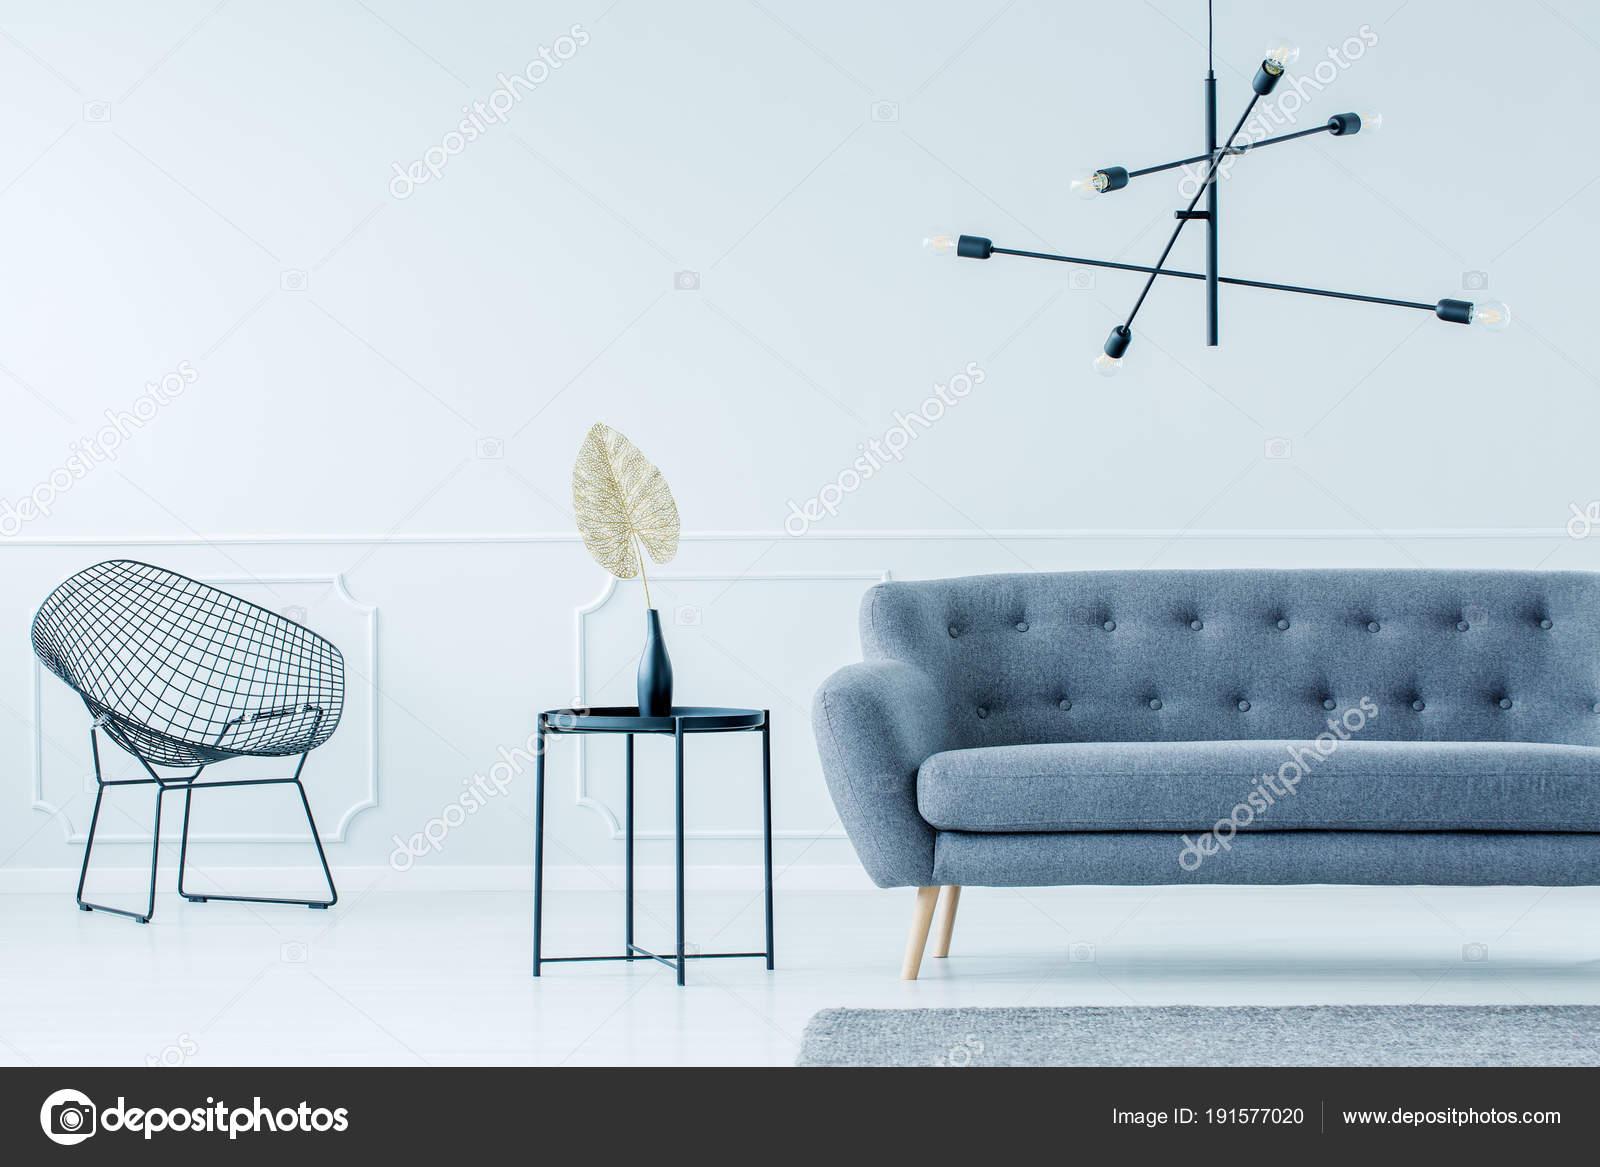 Groovy Chair Side Table And Sofa Stock Photo C Photographee Eu Beatyapartments Chair Design Images Beatyapartmentscom